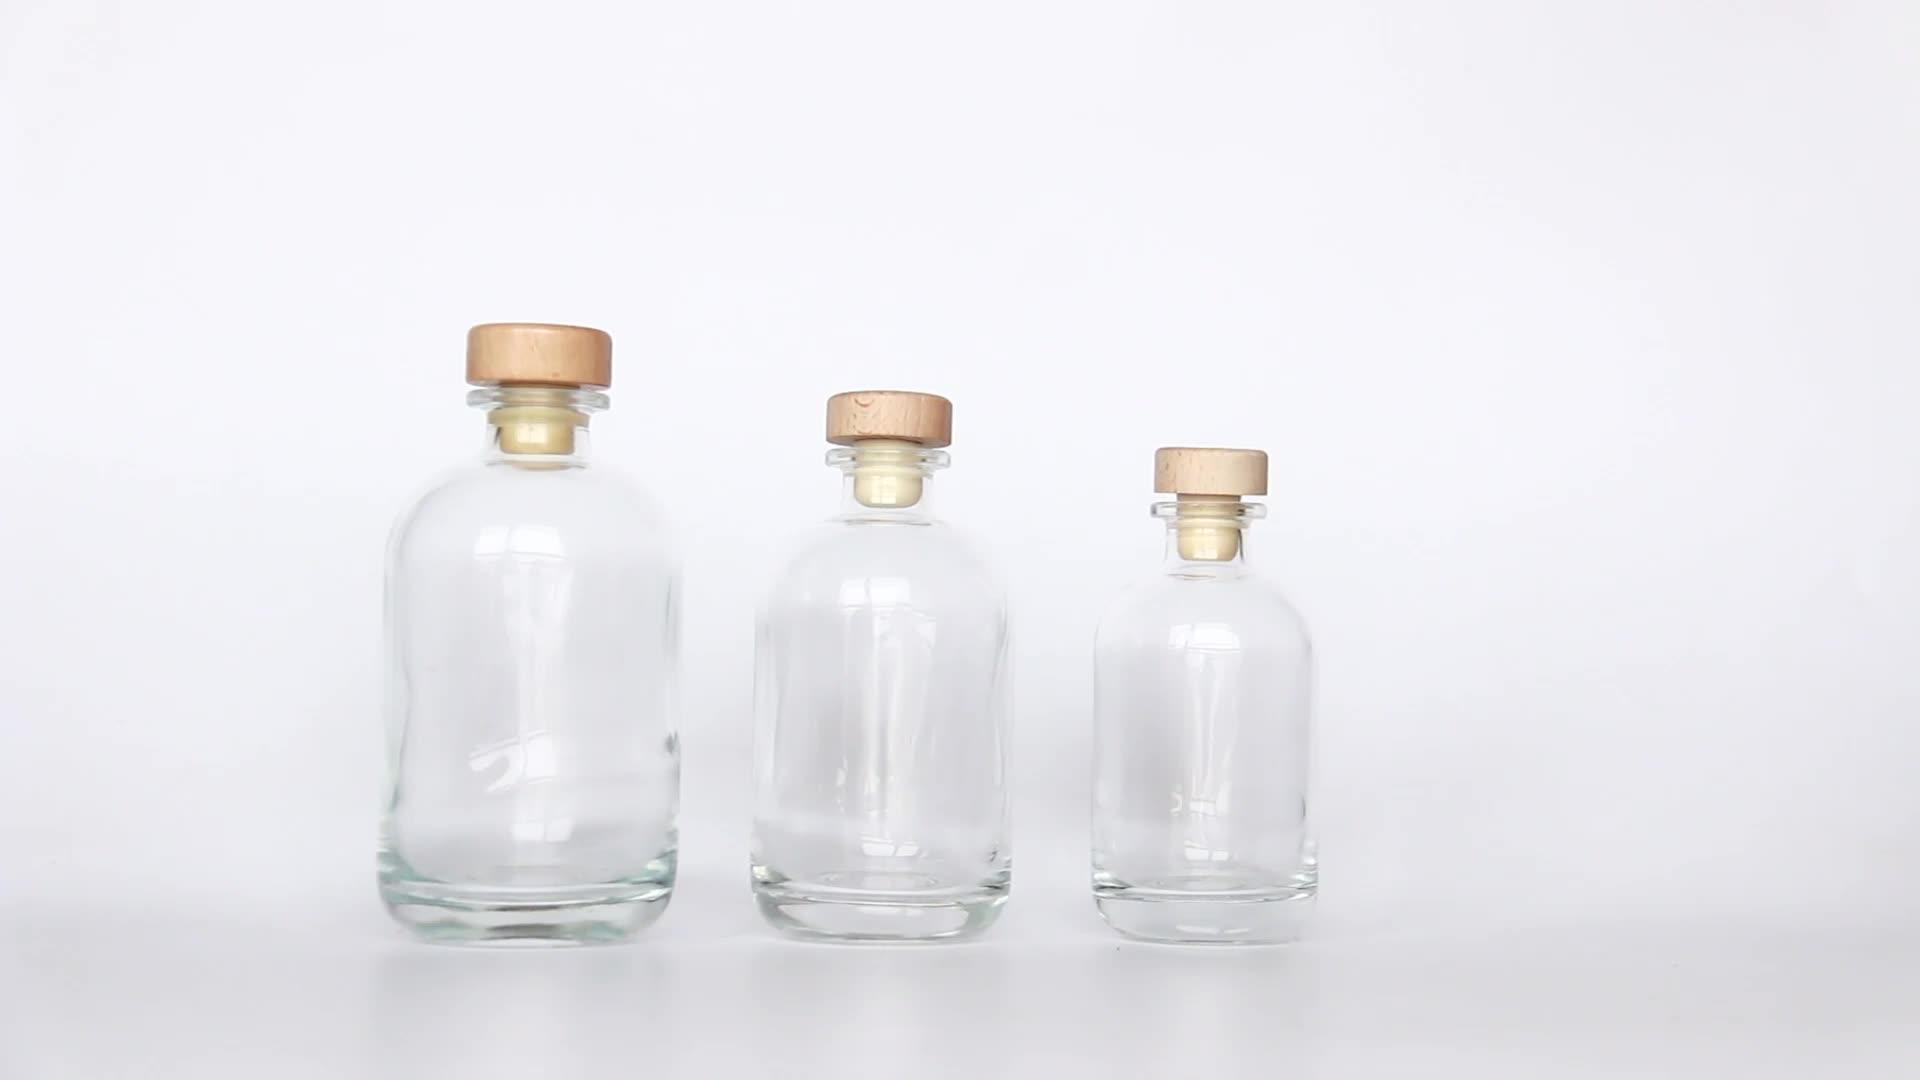 Kualitas Tinggi Frosted 250 Ml 375 Ml 500 Ml 8 Oz 12 Oz 16 Oz Gin Botol Kaca dengan Kayu cork Stopper